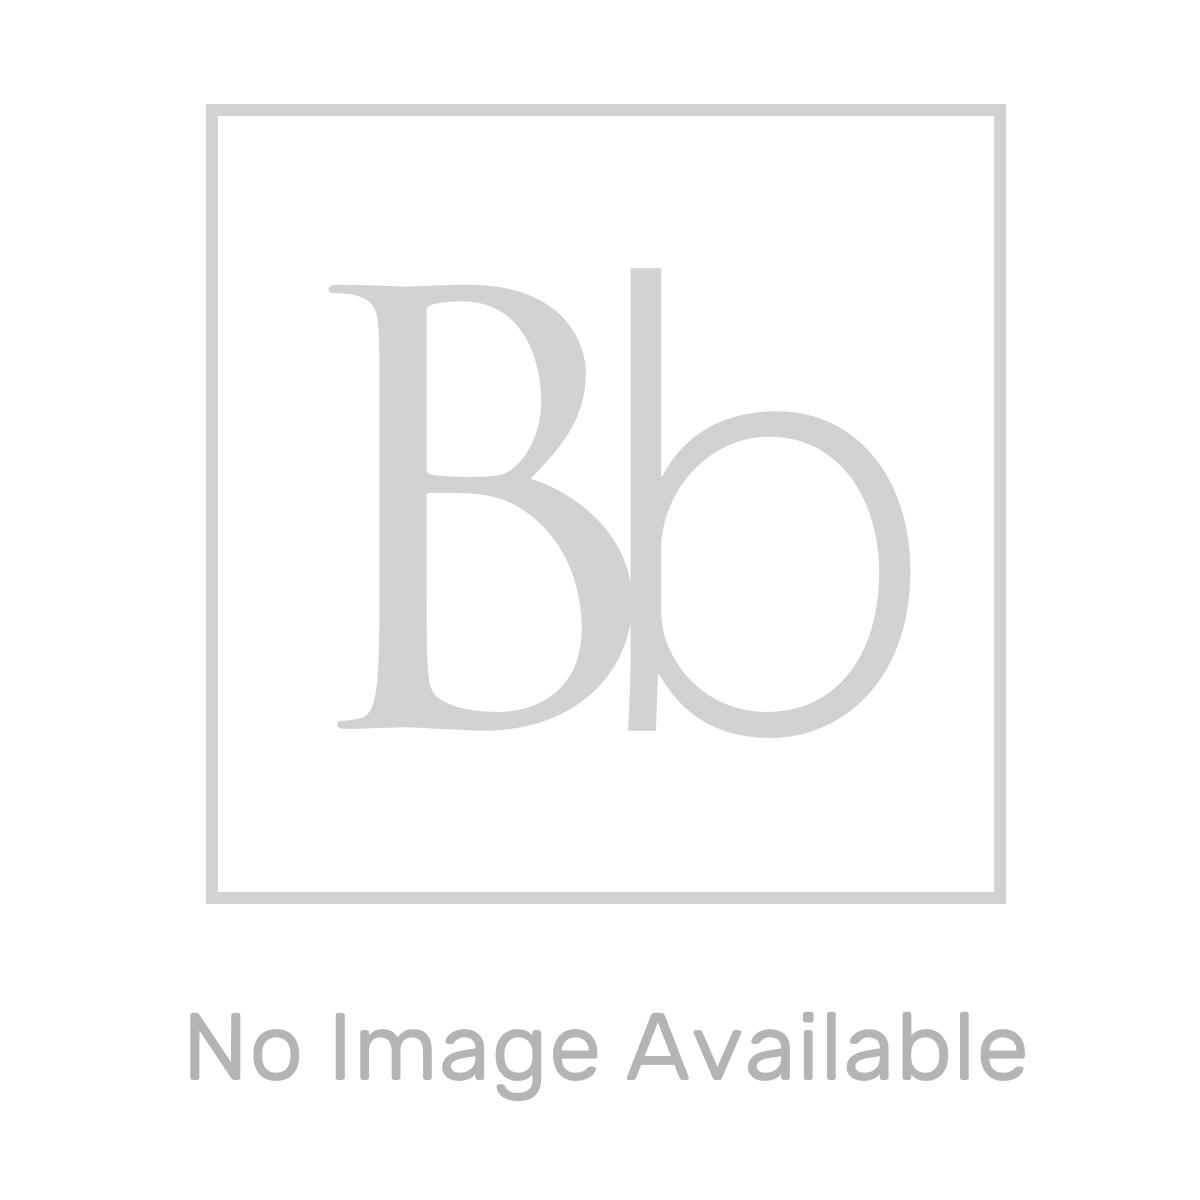 Stuart Turner 46500 Showermate Eco Standard Twin 2.0 Bar Pump